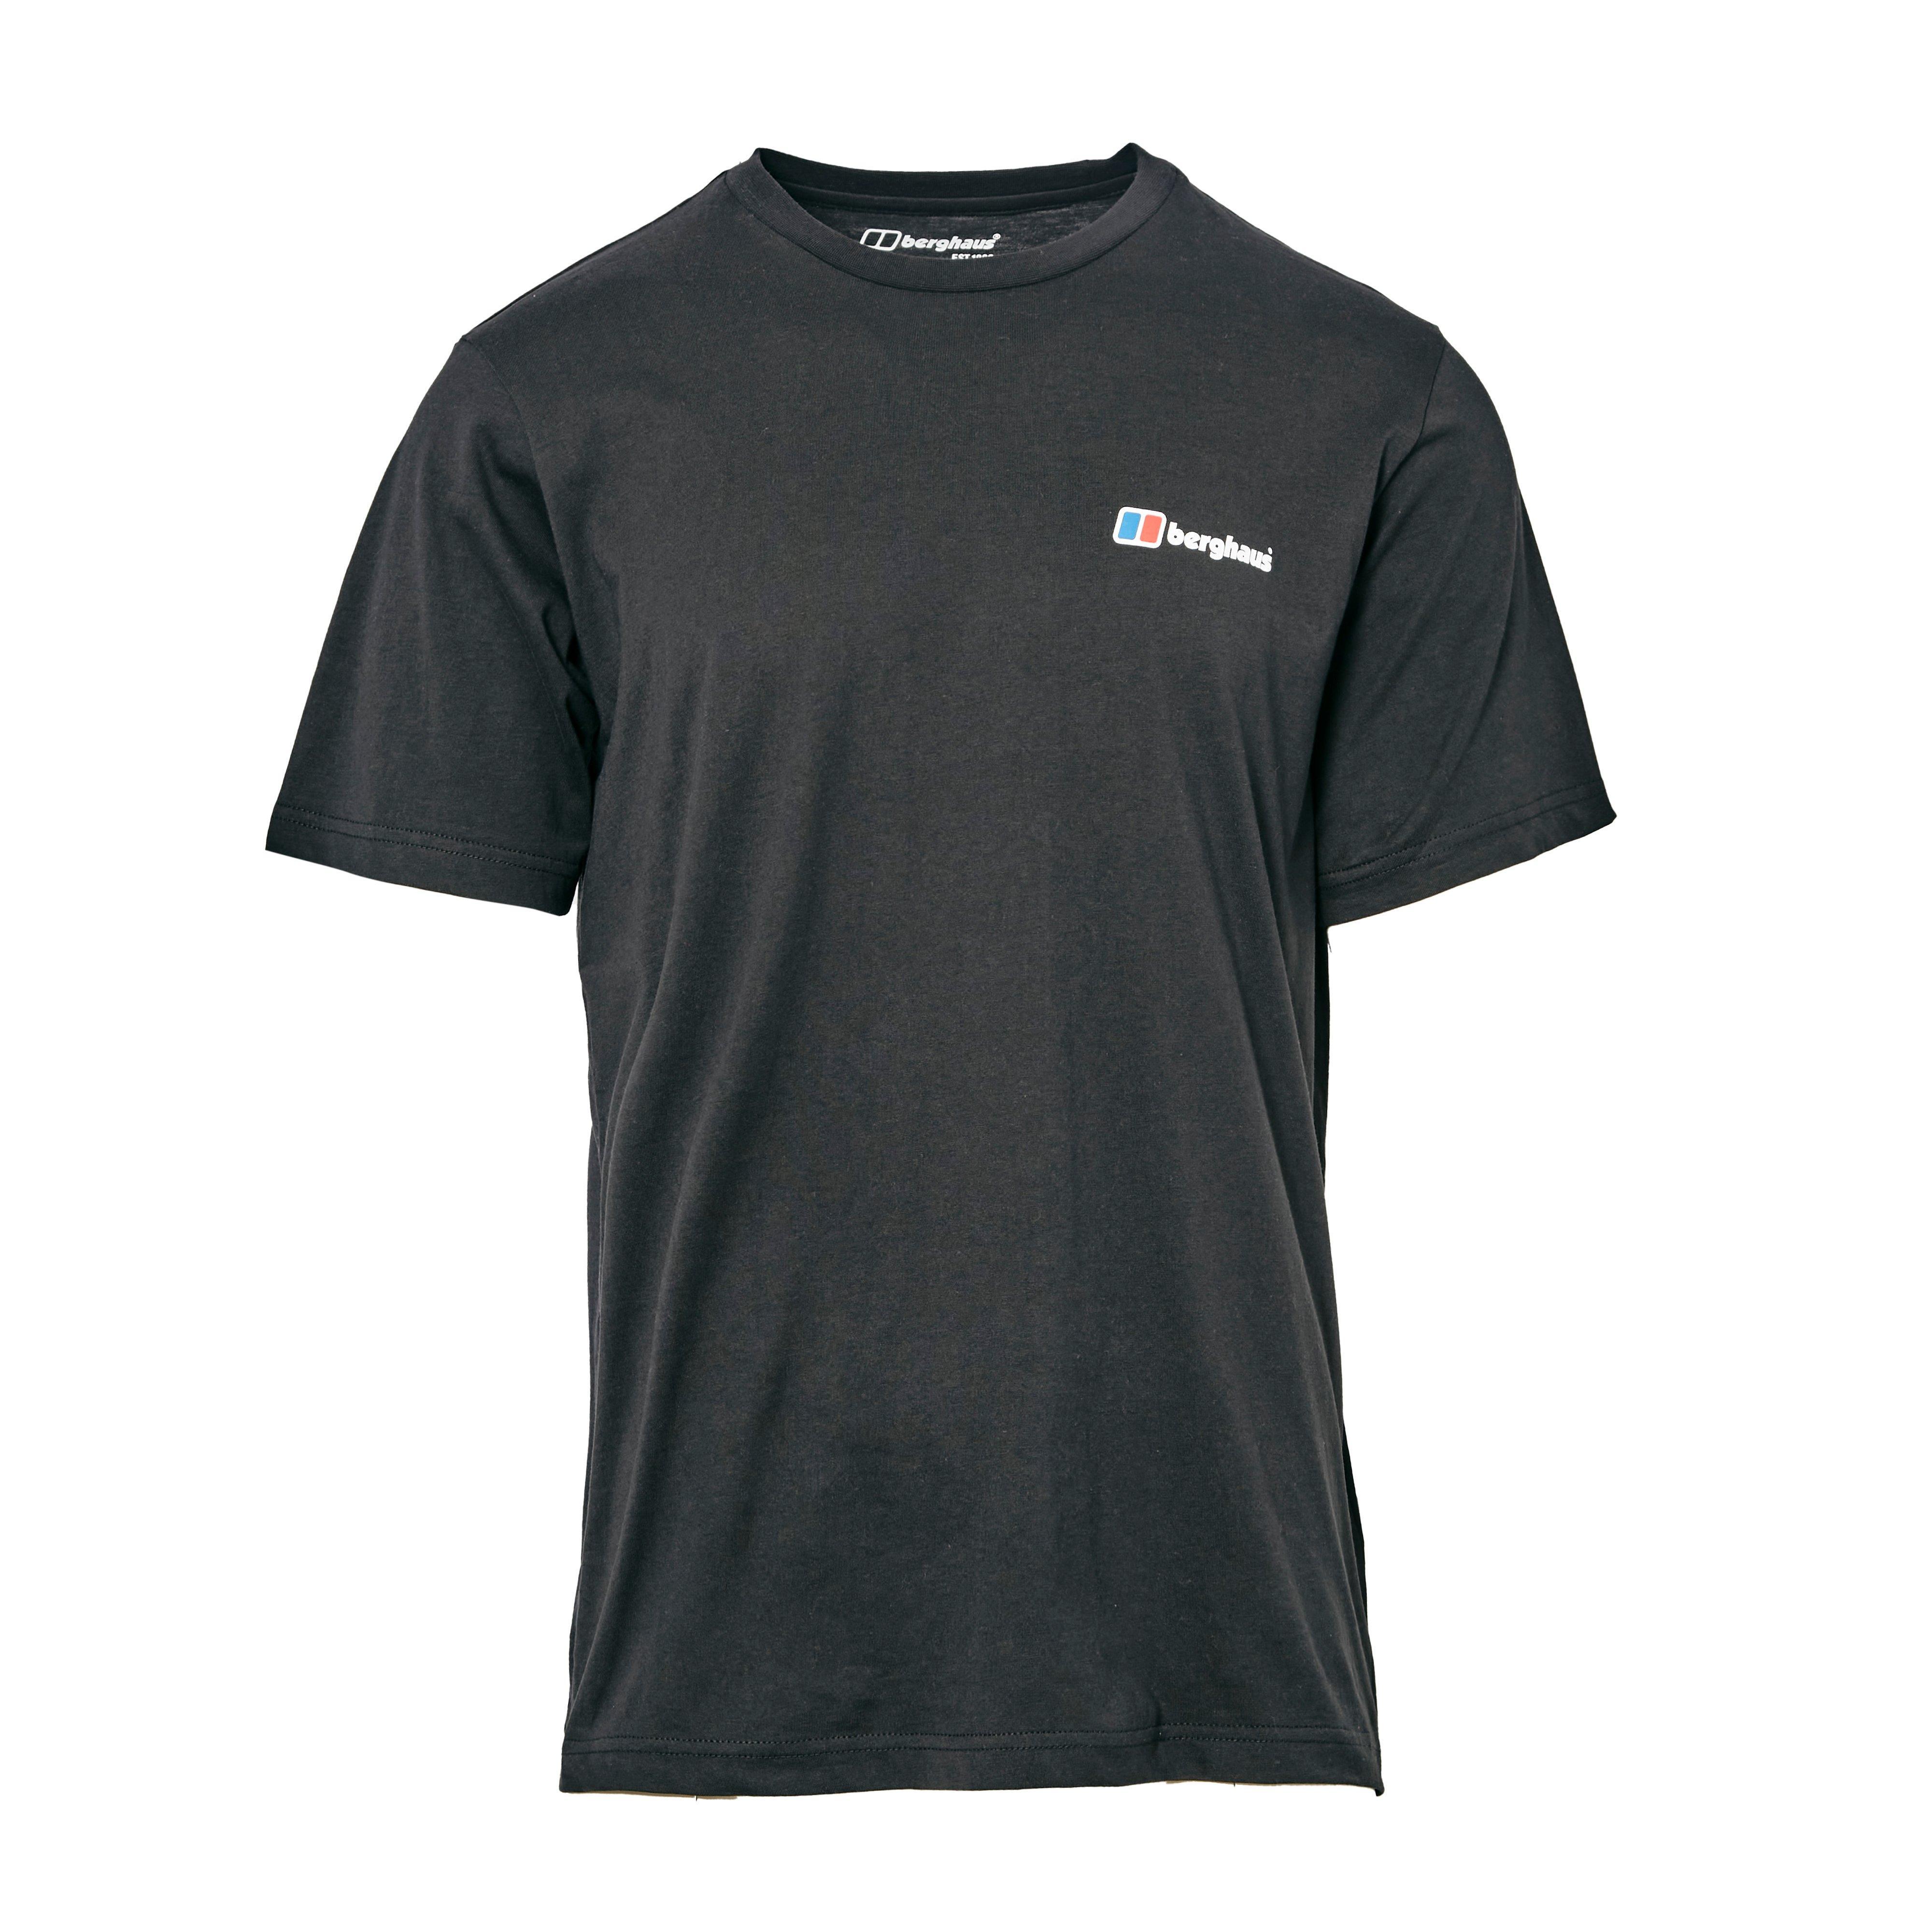 Berghaus Mens Logo T-shirt - Black/black  Black/black